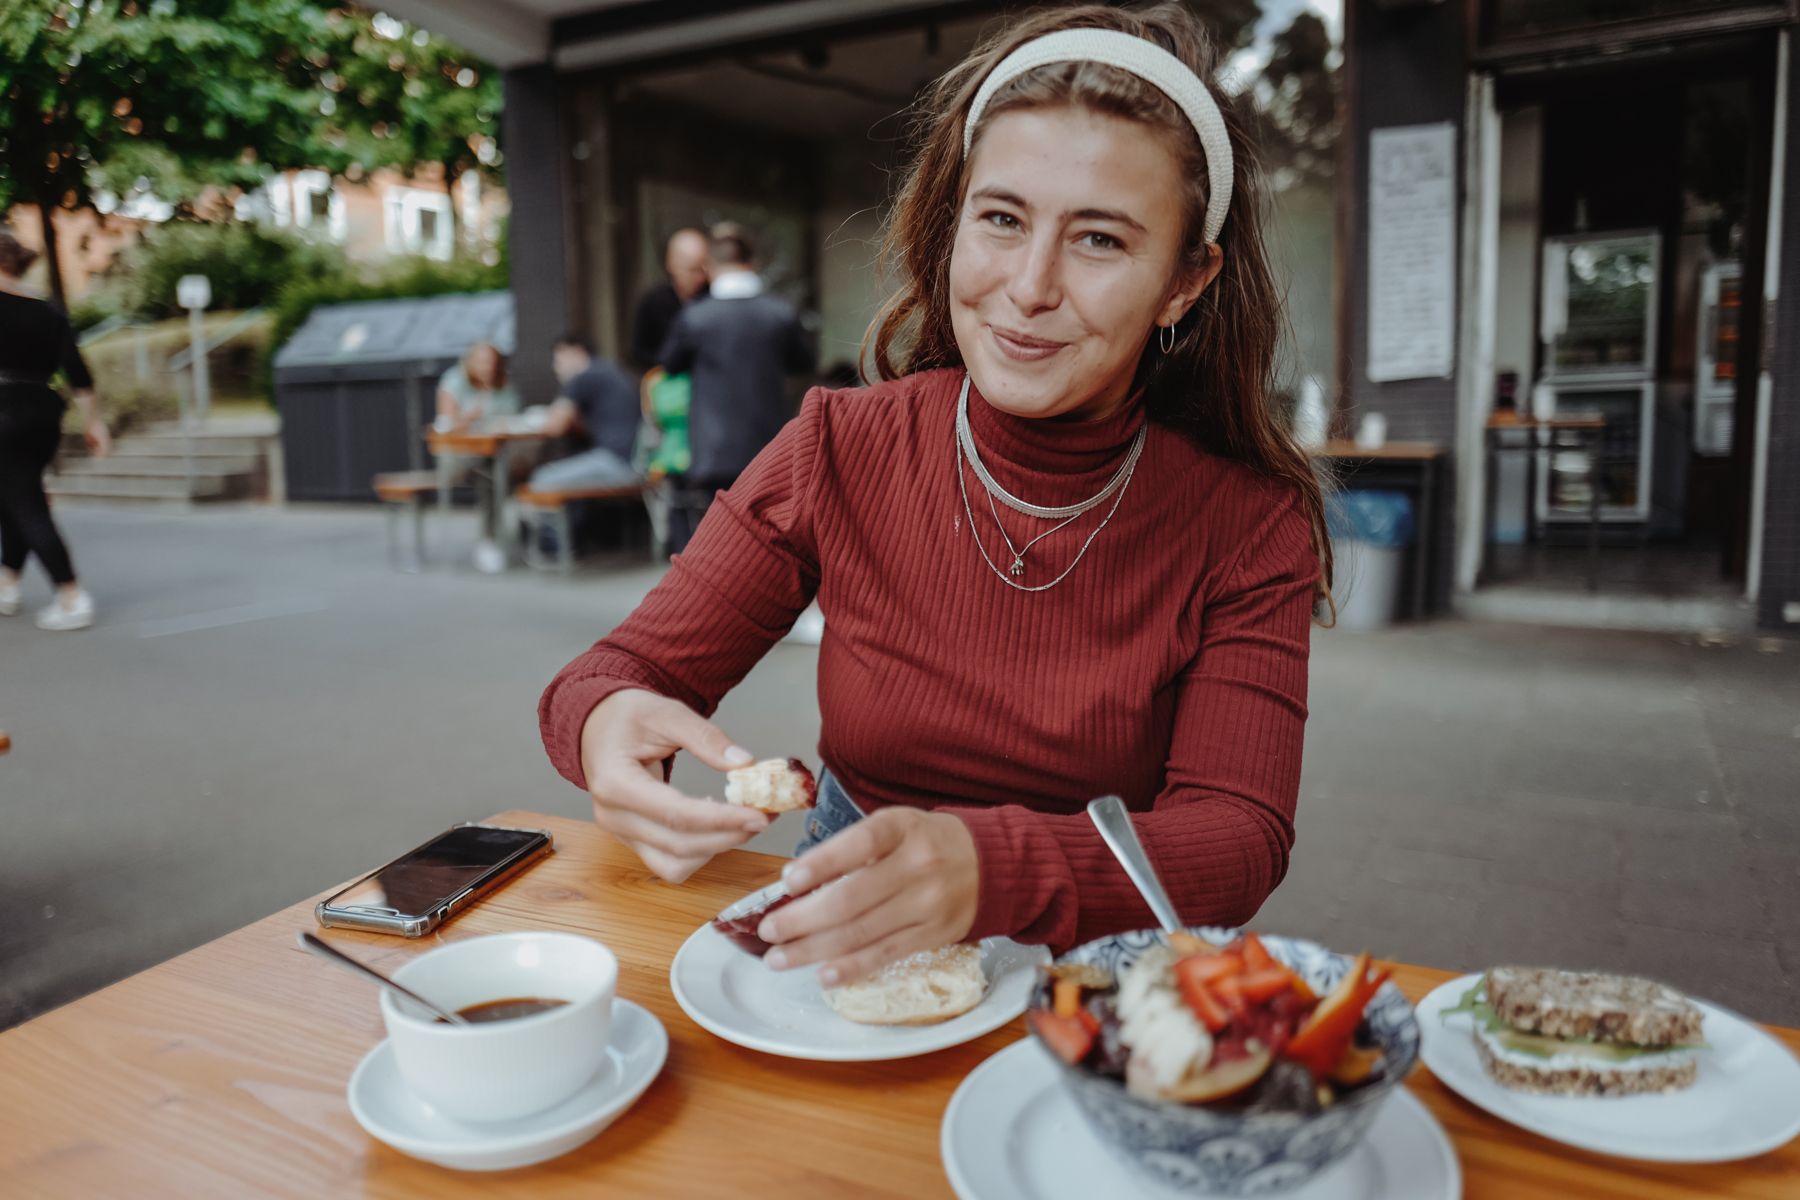 Geheimtipp Hamburg Neustadt Cafe Johanna Dahlina Sophie Kock13